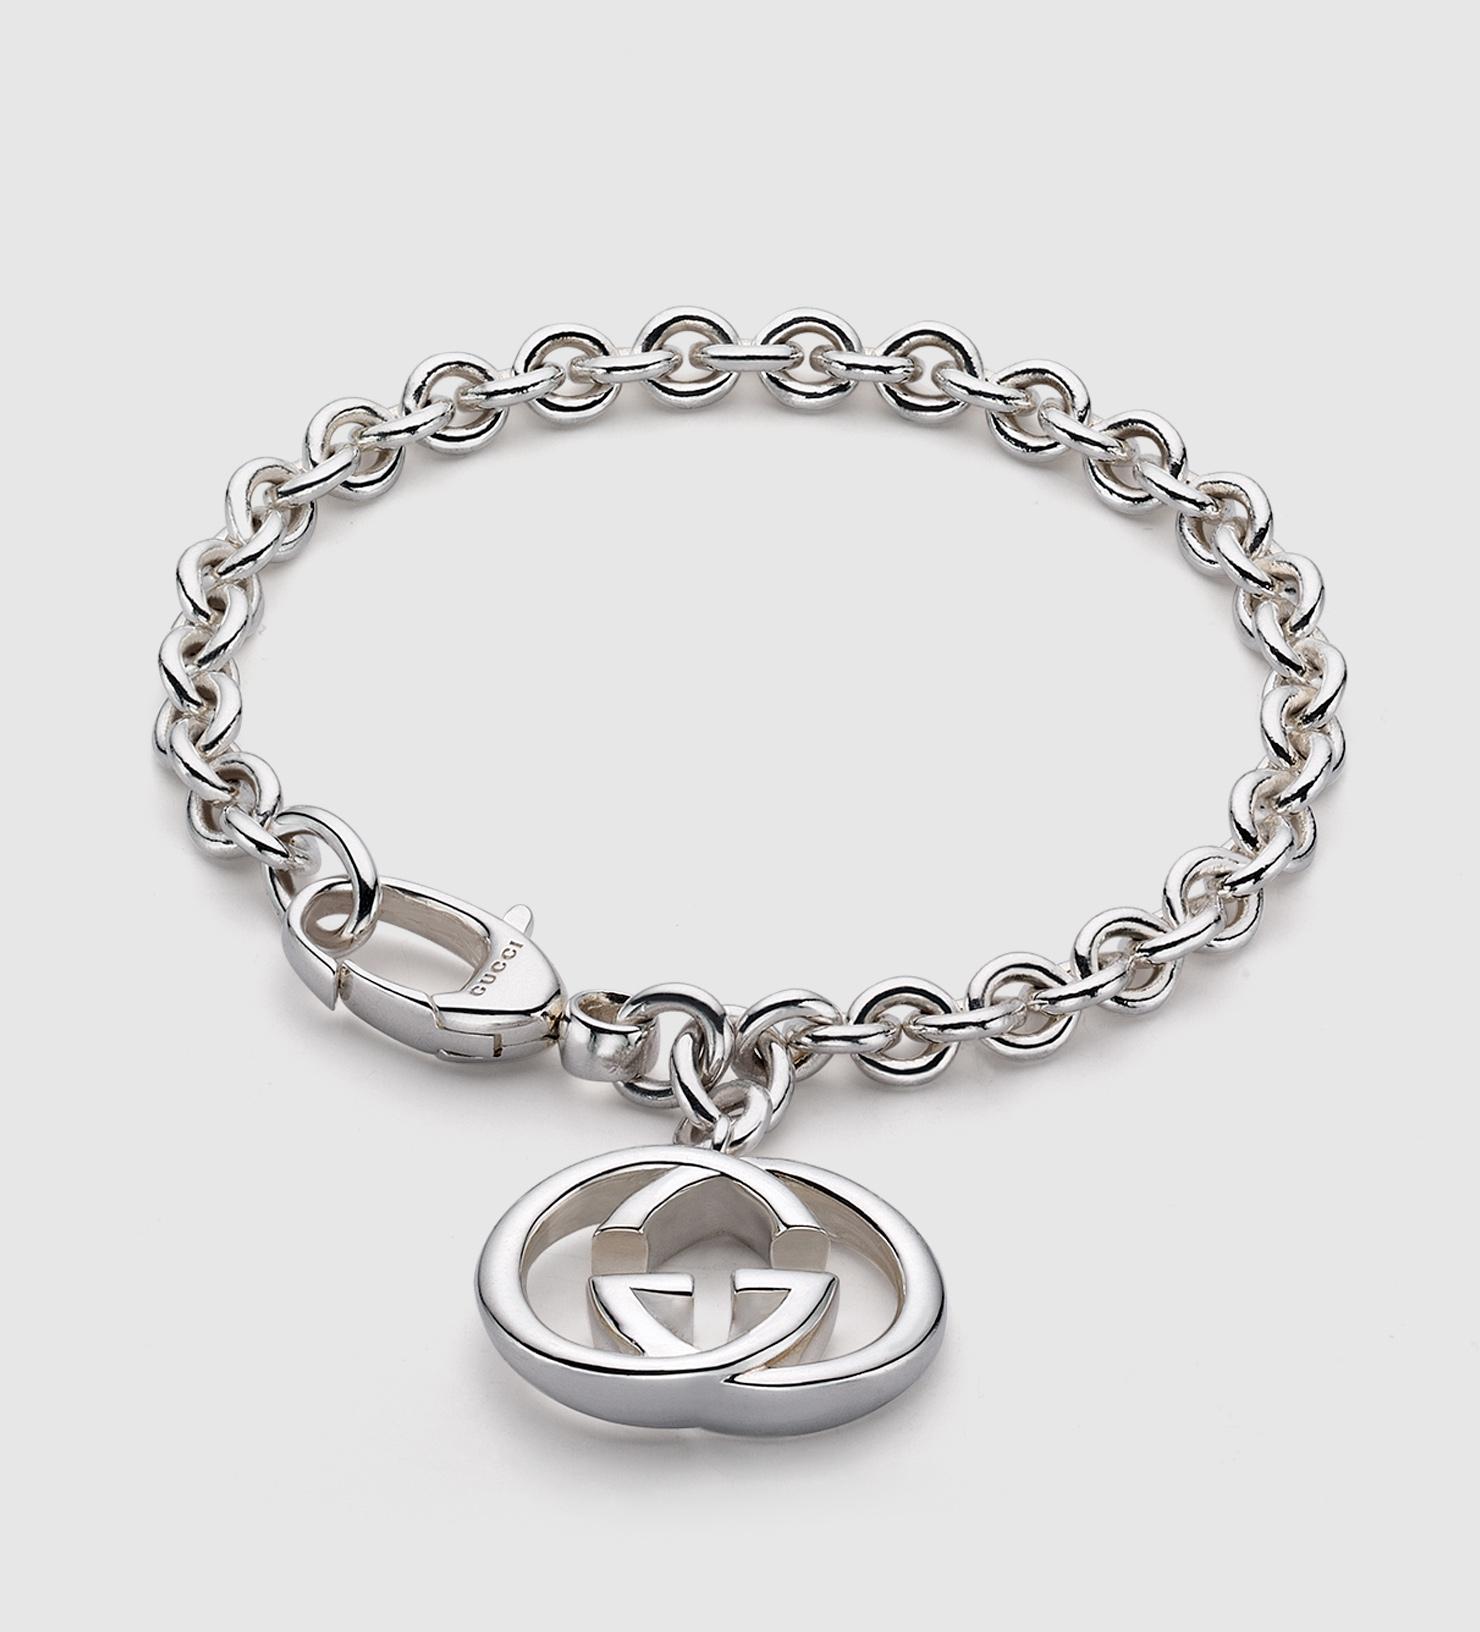 gucci bracelet with interlocking g motif charm in metallic